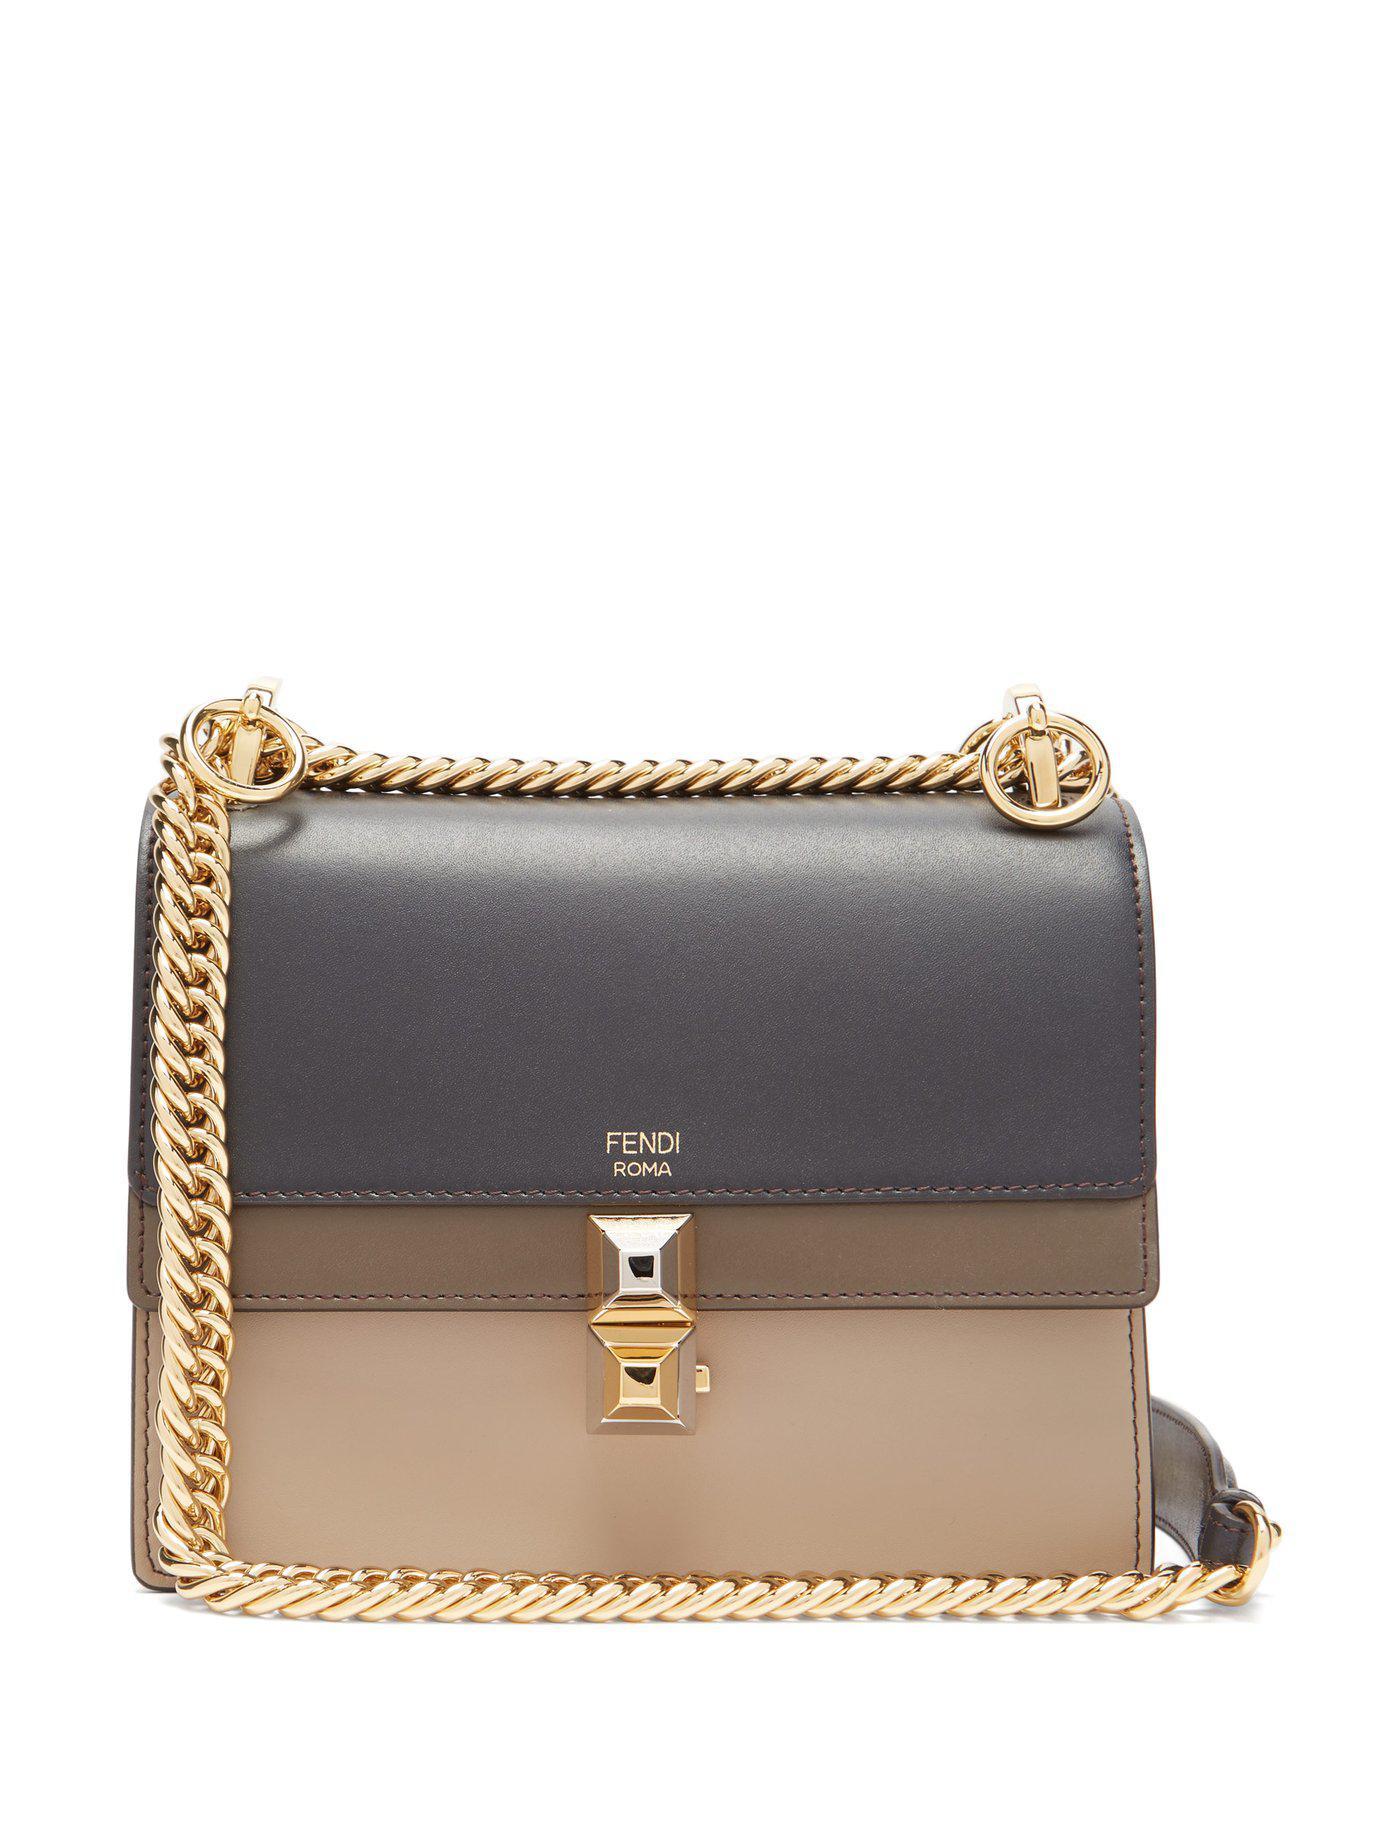 Fendi. Women s Kan I Stripe Small Leather Cross Body Bag 758c9c41d5ce6